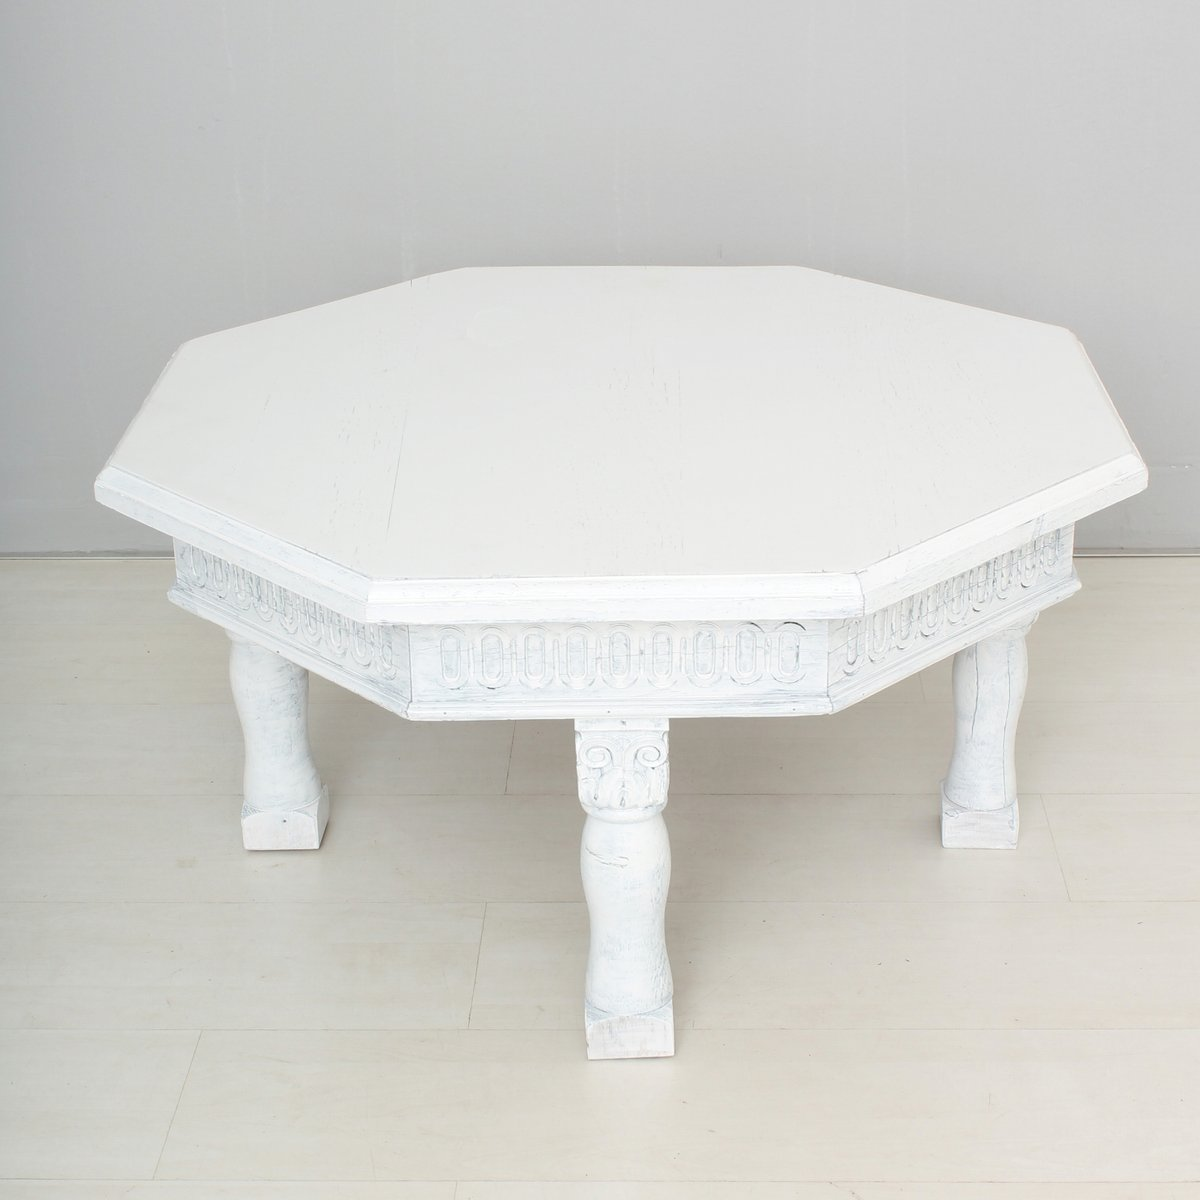 Table basse vintage blanche en vente sur pamono - Tables basses blanches ...